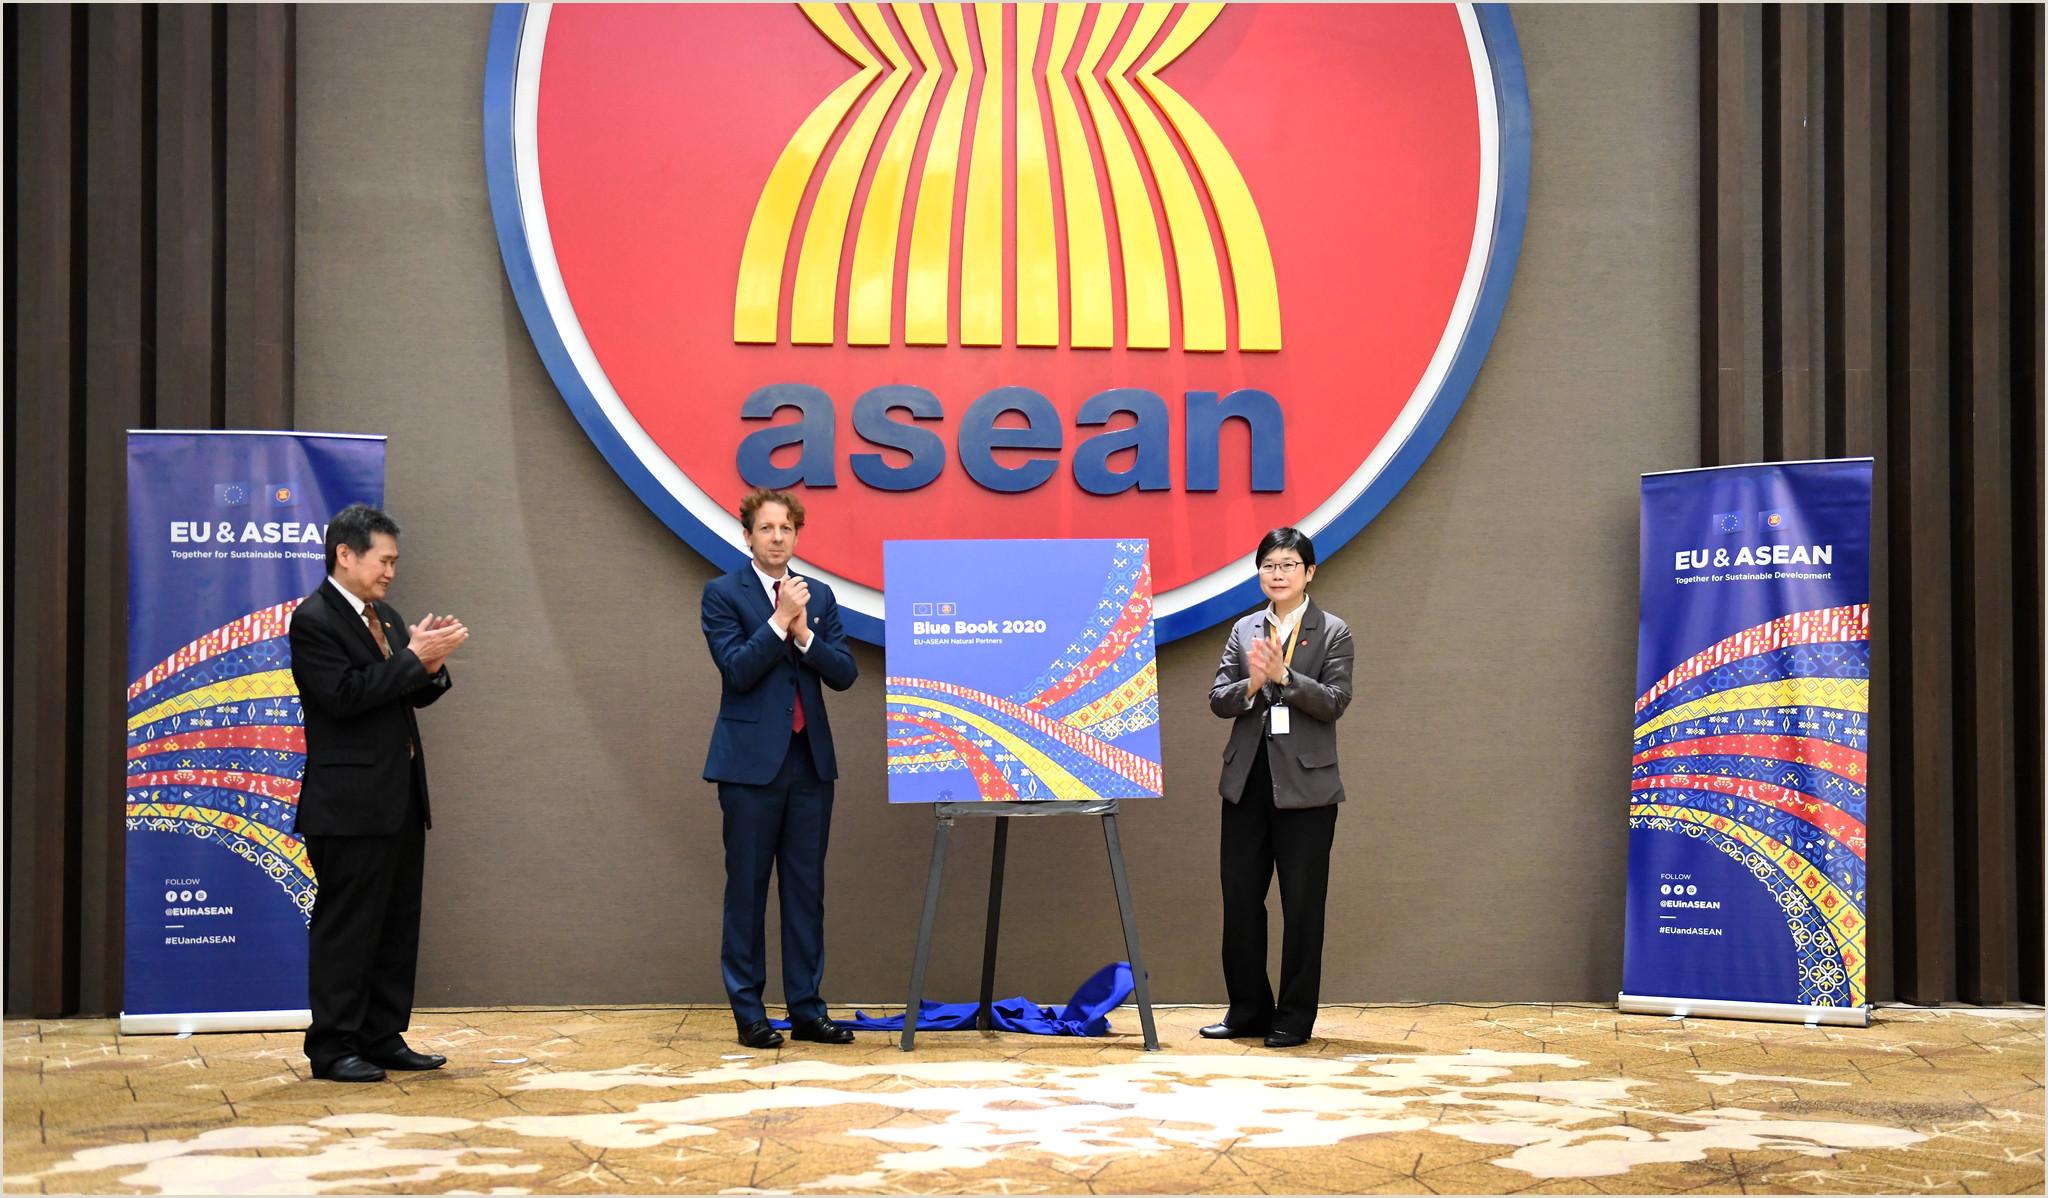 Book Signing Banner 27th Asean Eu Jcc Meeting & Eu Asean Blue Book Launch